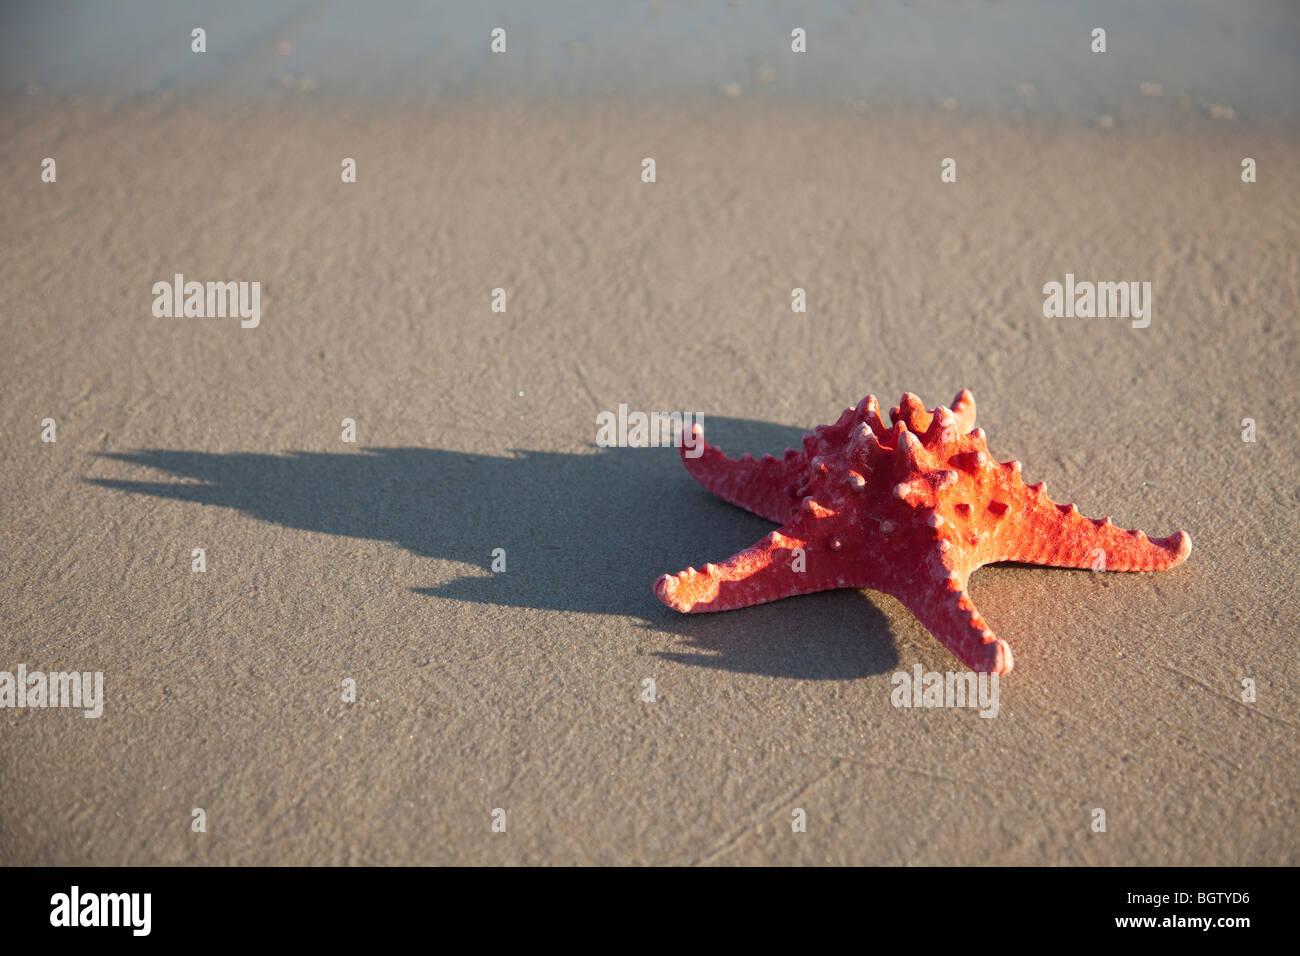 Red starfish on wet sand - Stock Image